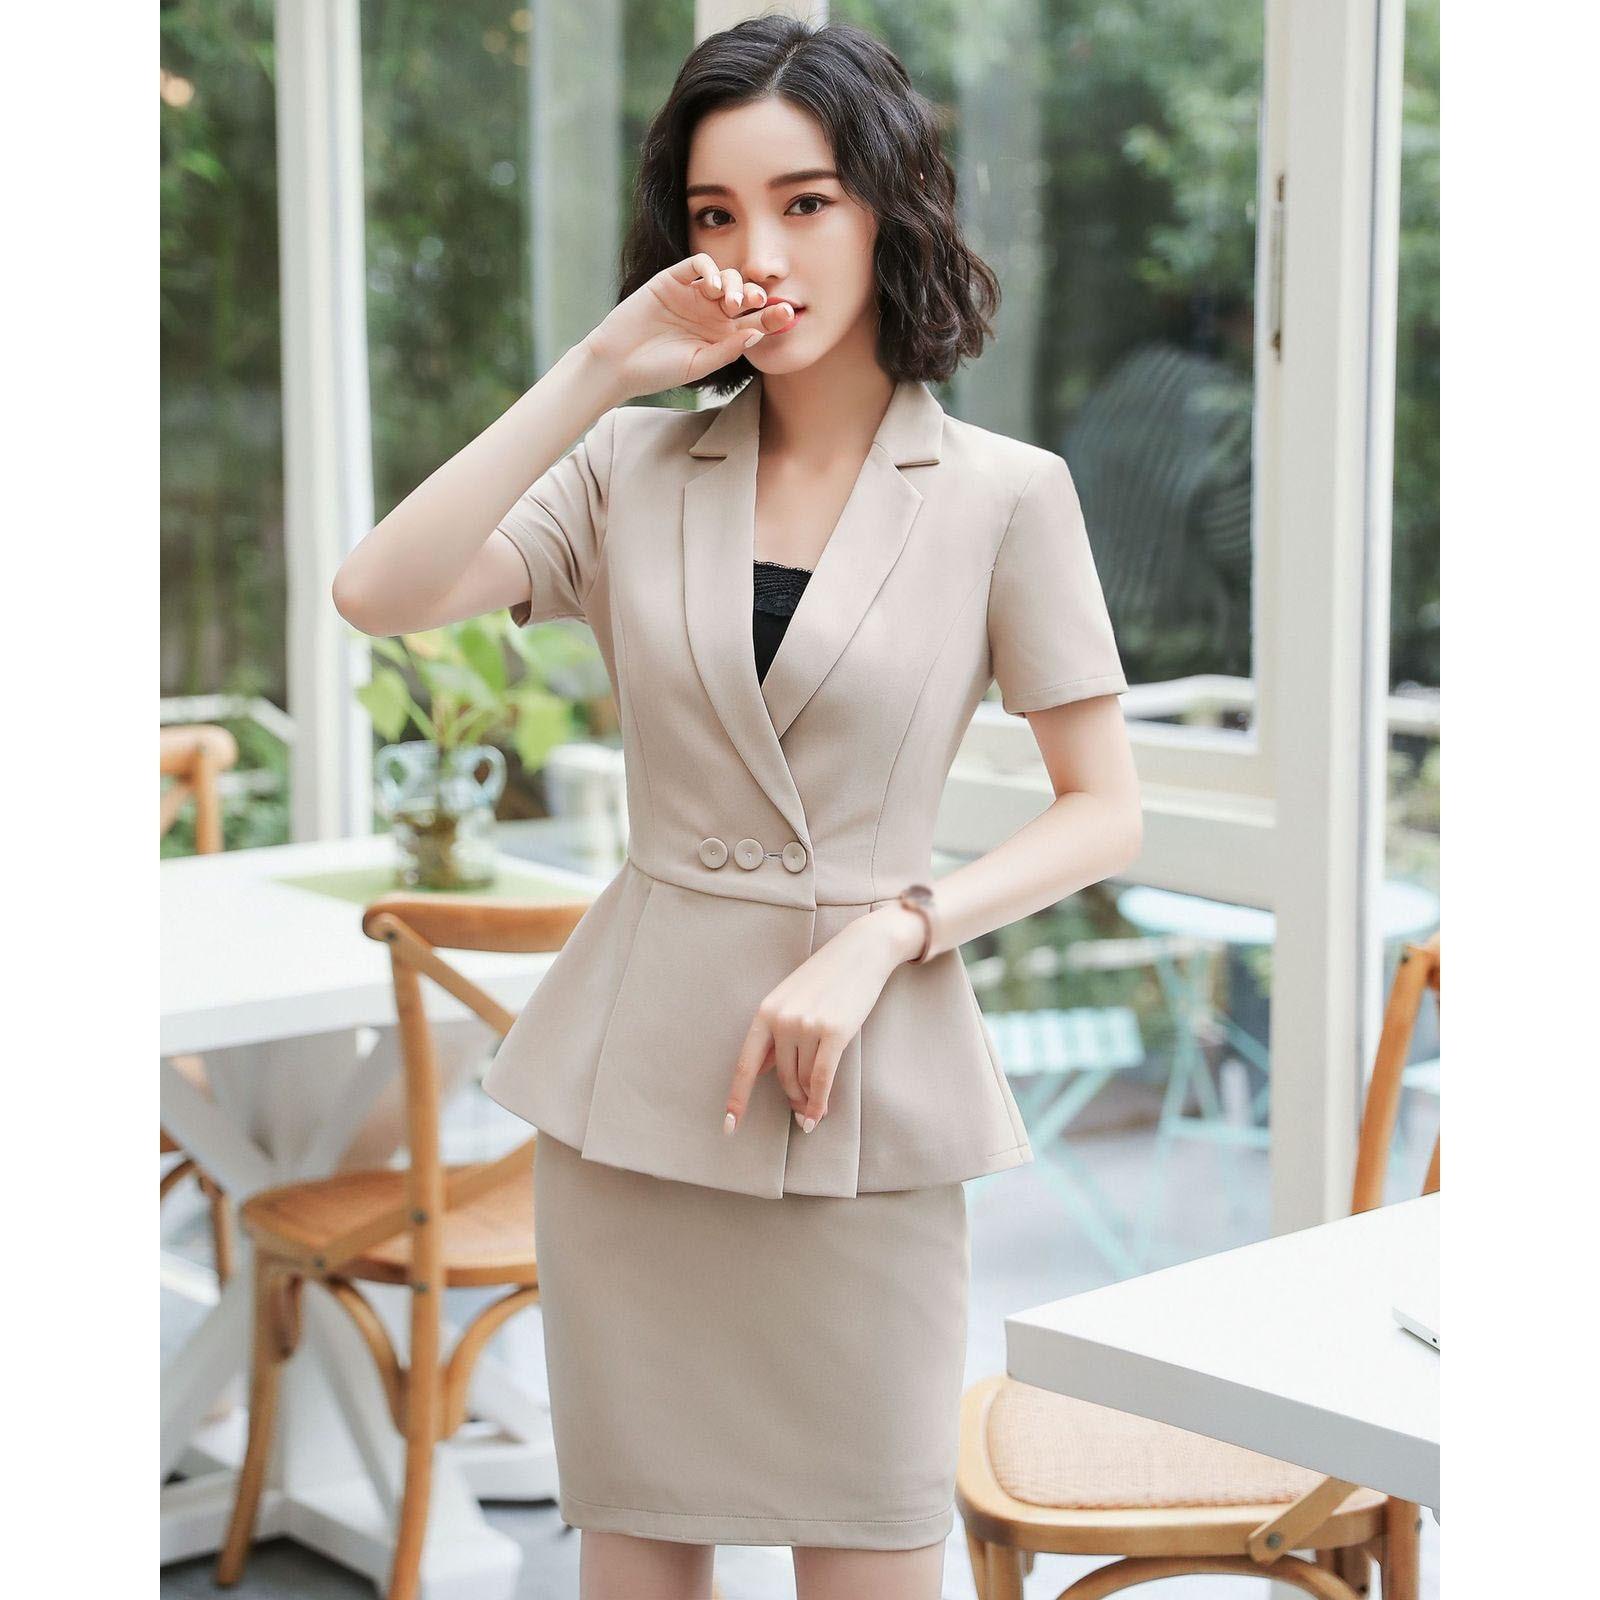 Elegant Summer Women Plus Size Blazers 2 Pieces Set Pleated Tops Mini Skirt Set Ladies Office Work Wear Uniforms Sets